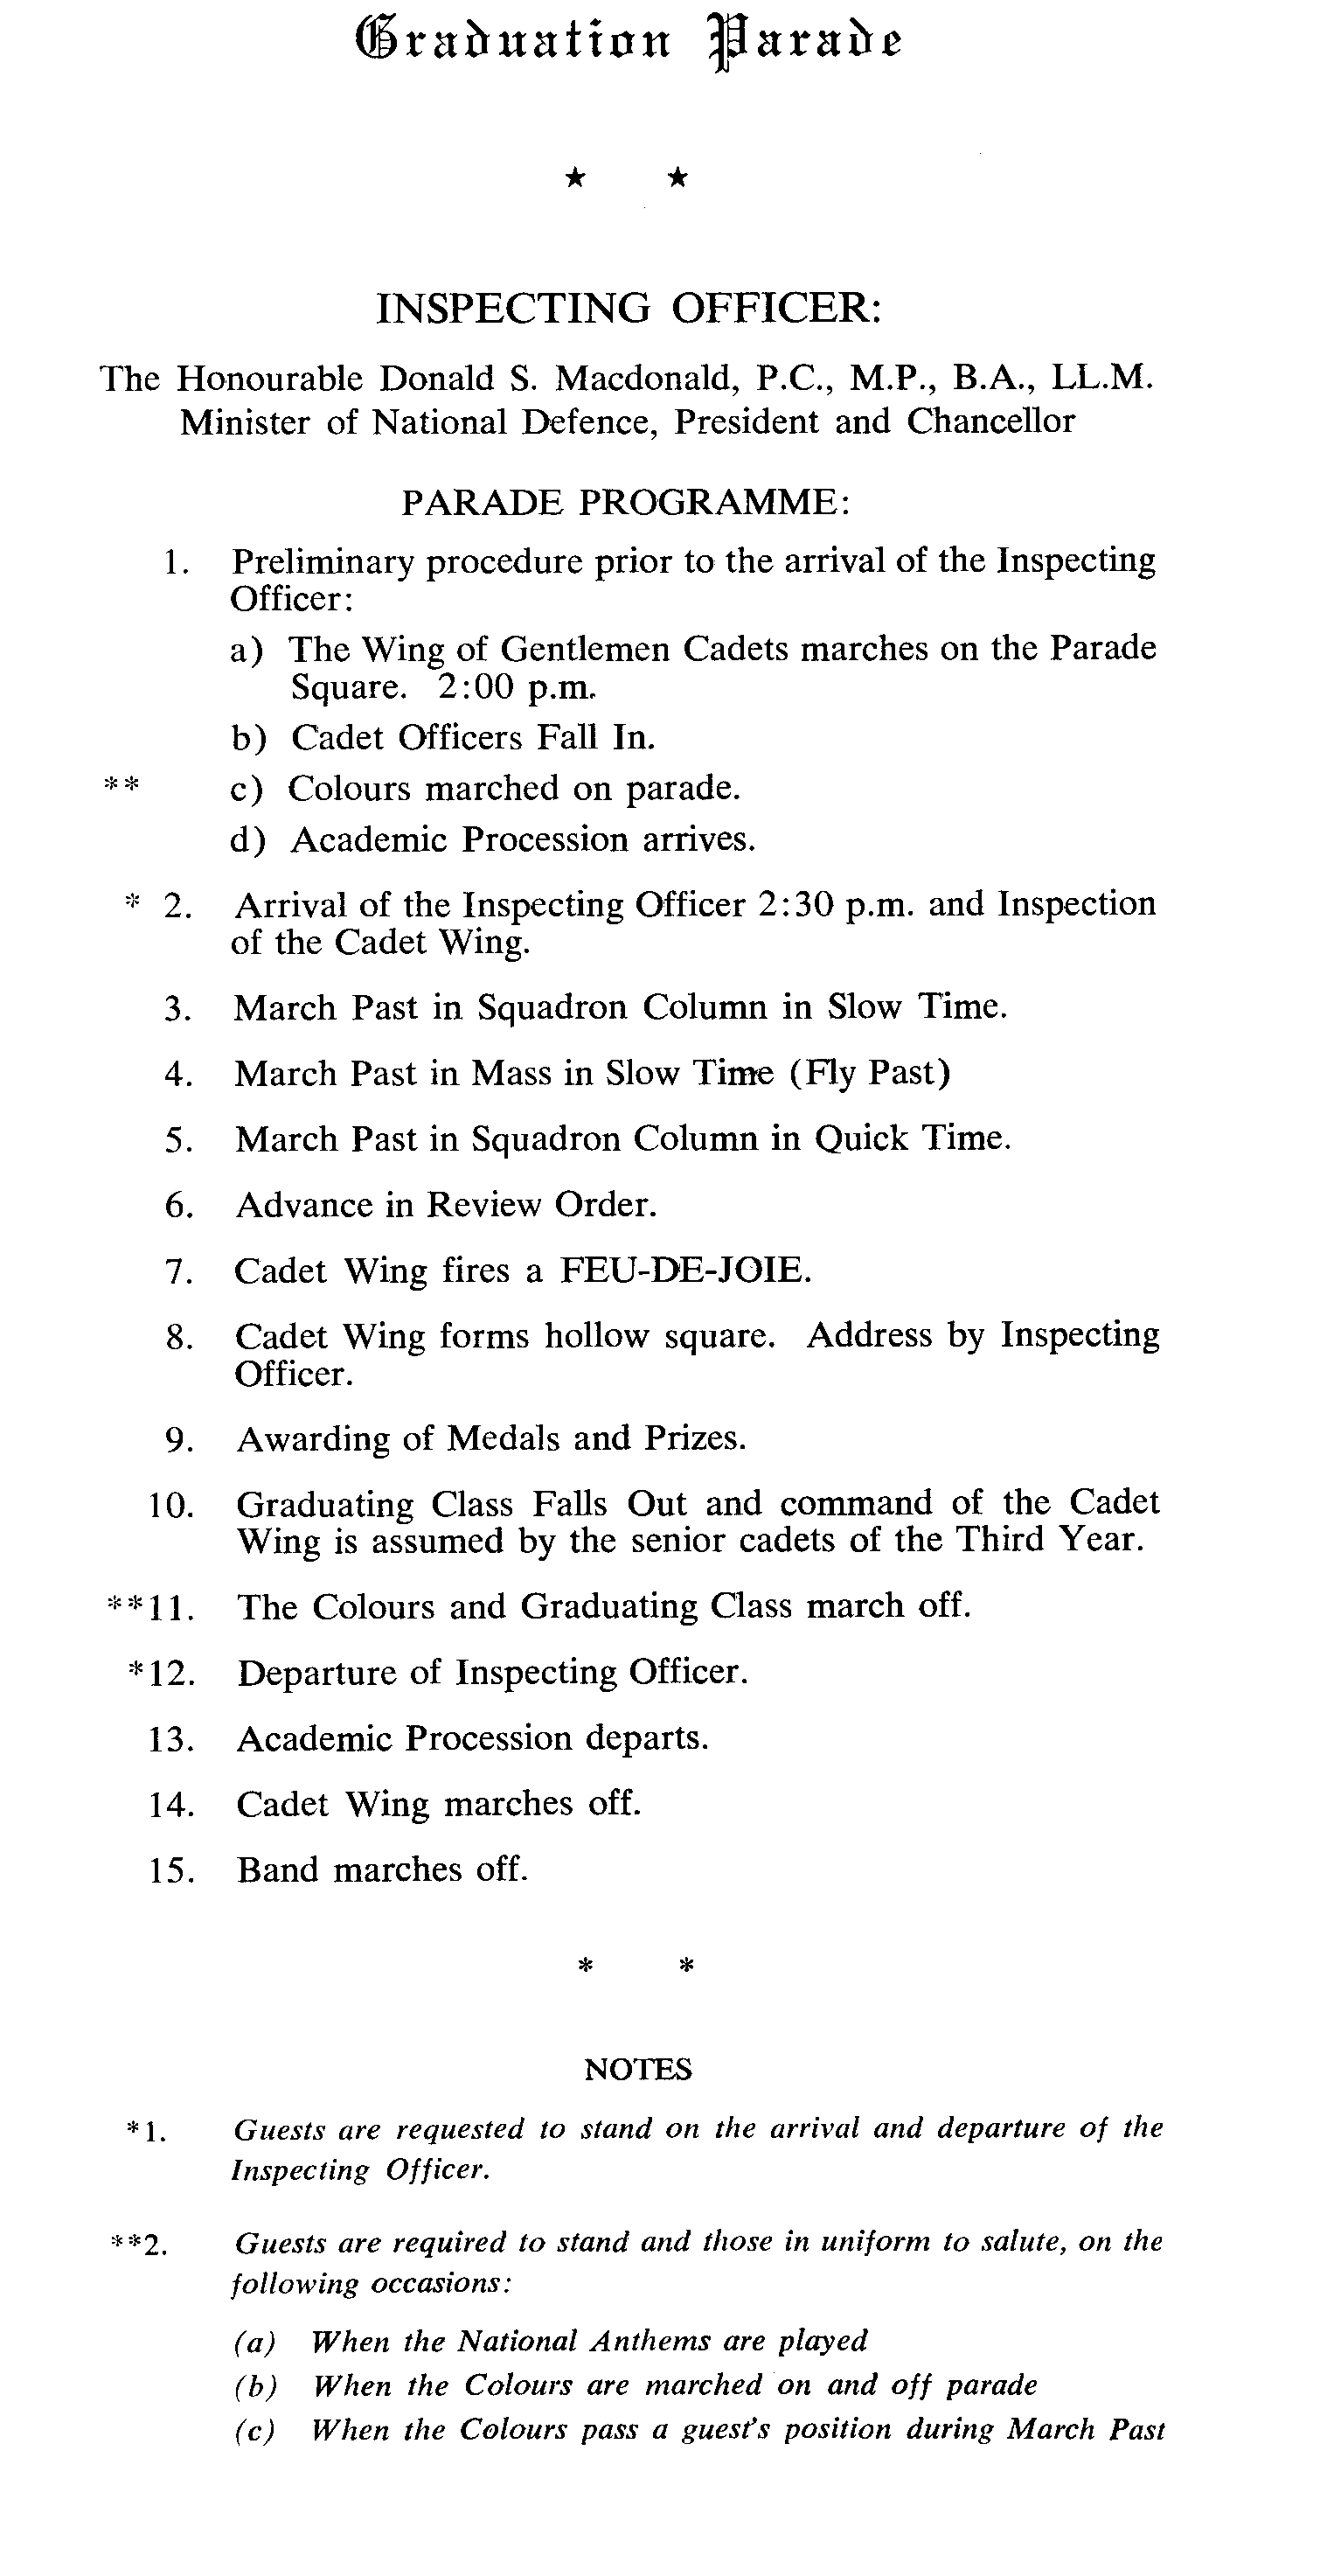 5_RMC-Graduation Ceremonies-22 May 1971-P2